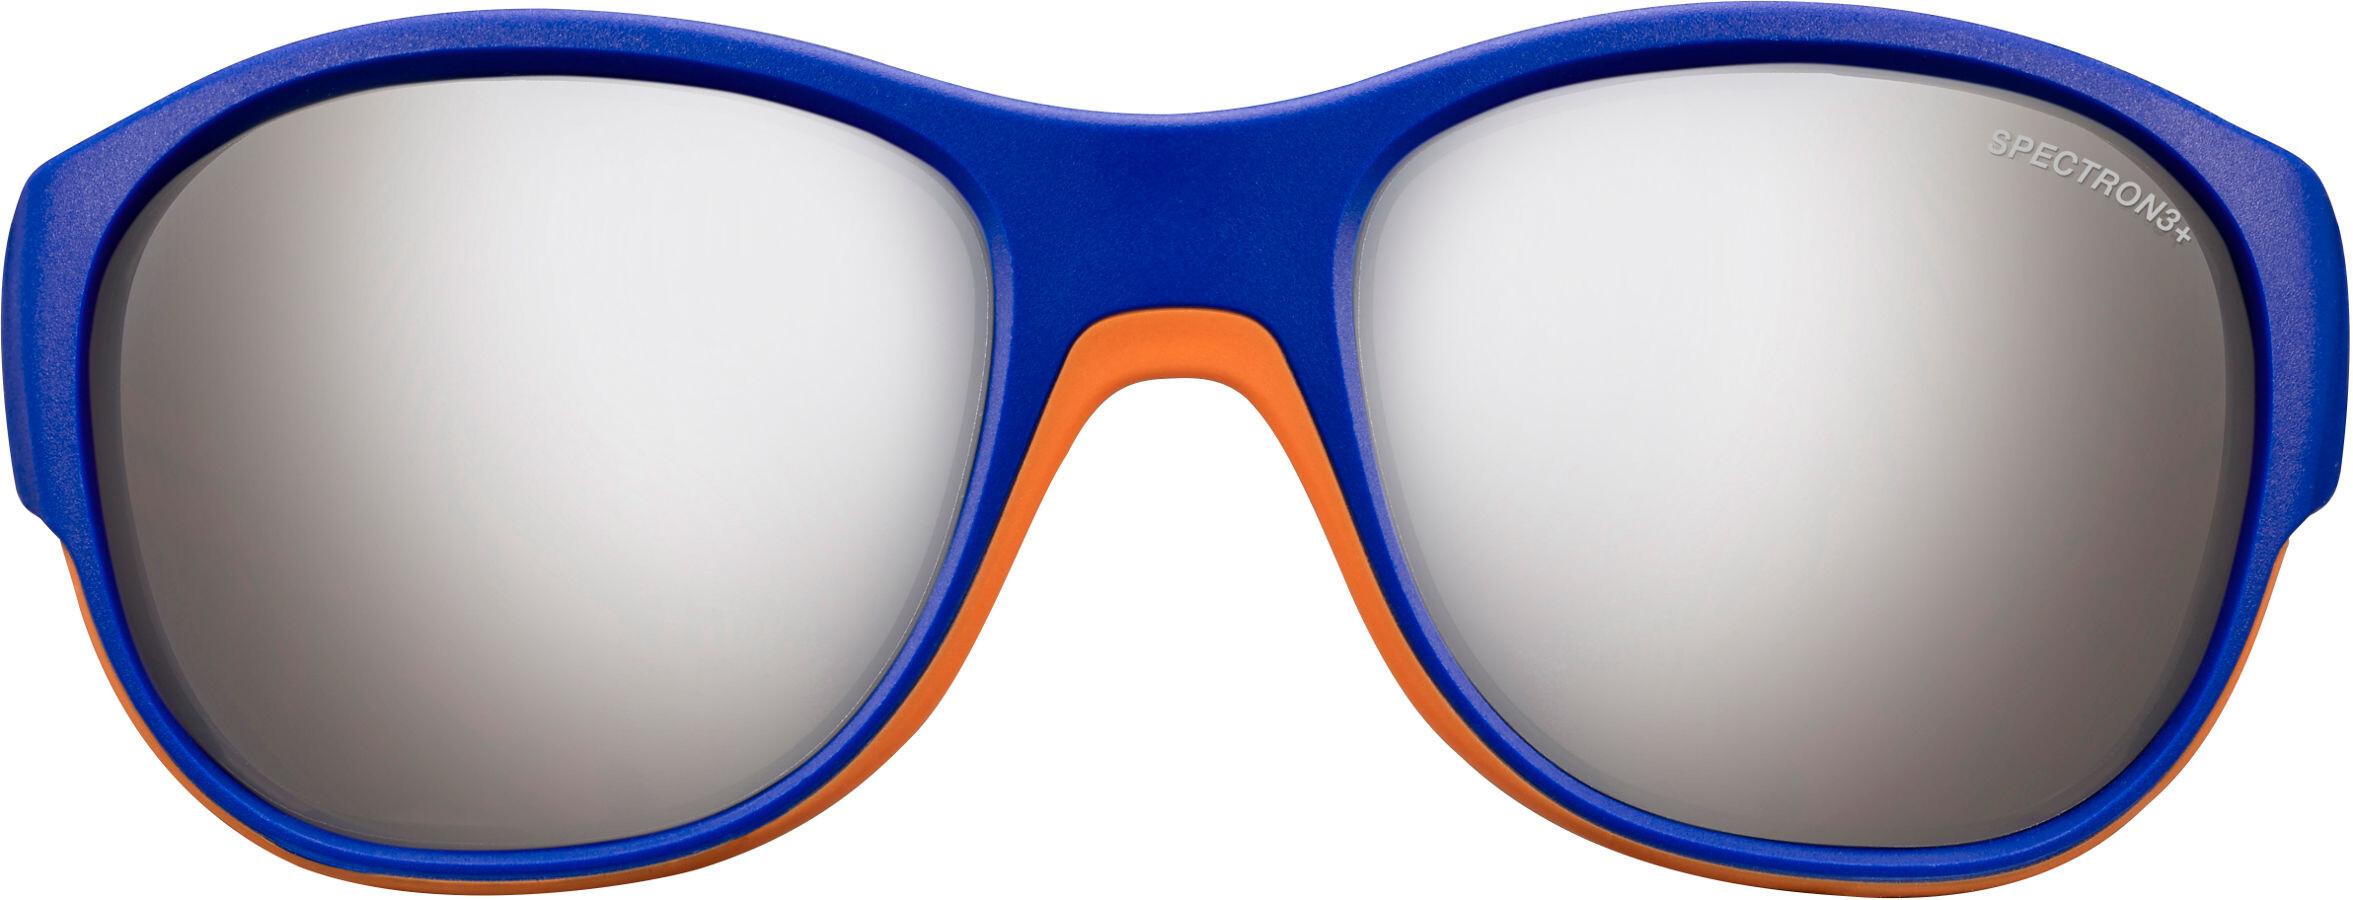 8c8094addef5 Julbo Luky Spectron 3+ Glasses Children 4-6Y orange/blue at ...